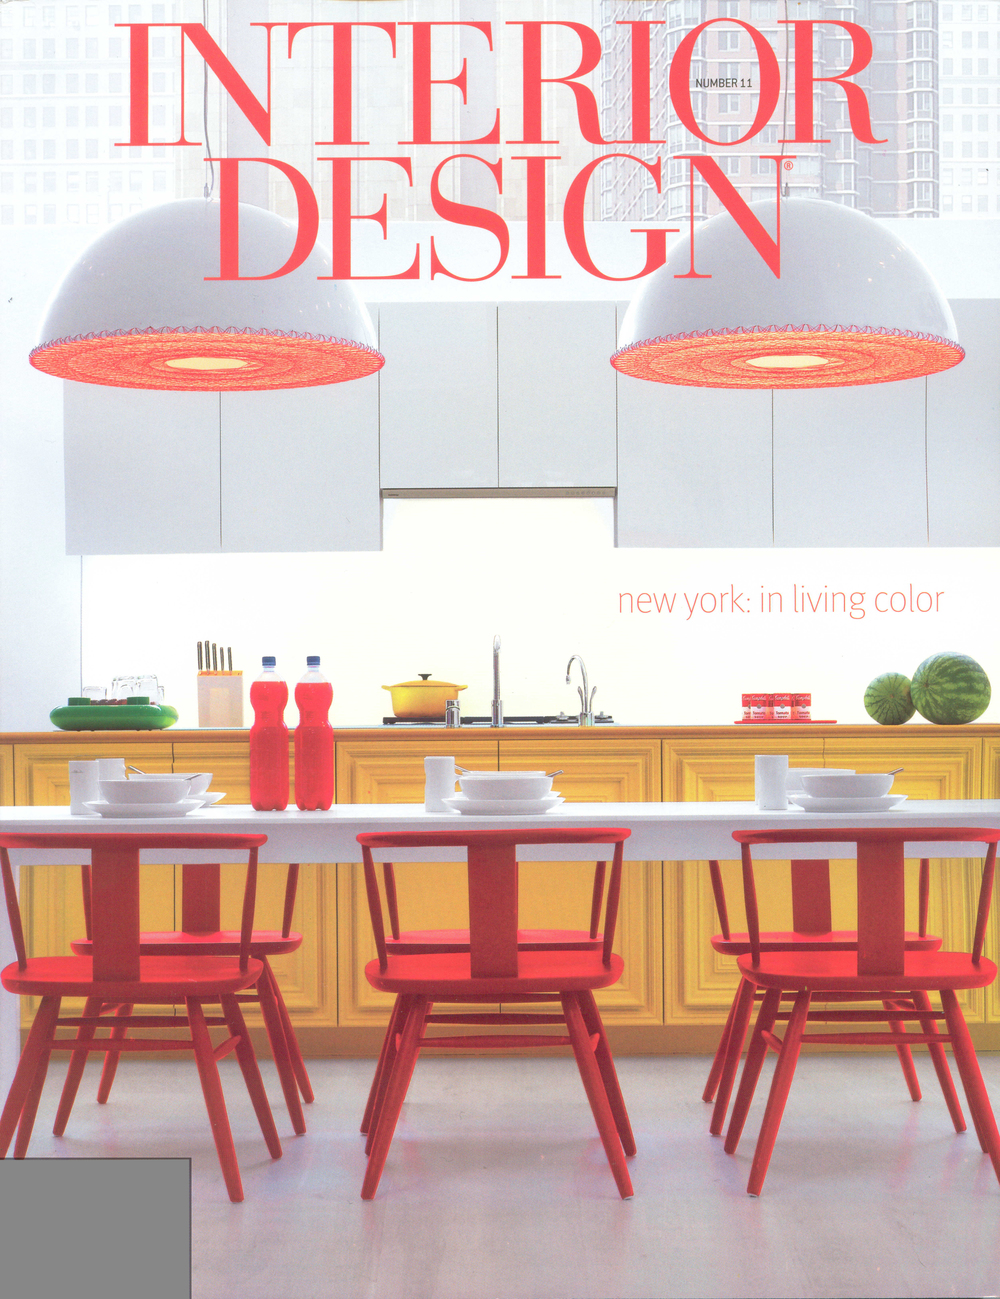 Interior design for The interior design reference specification book